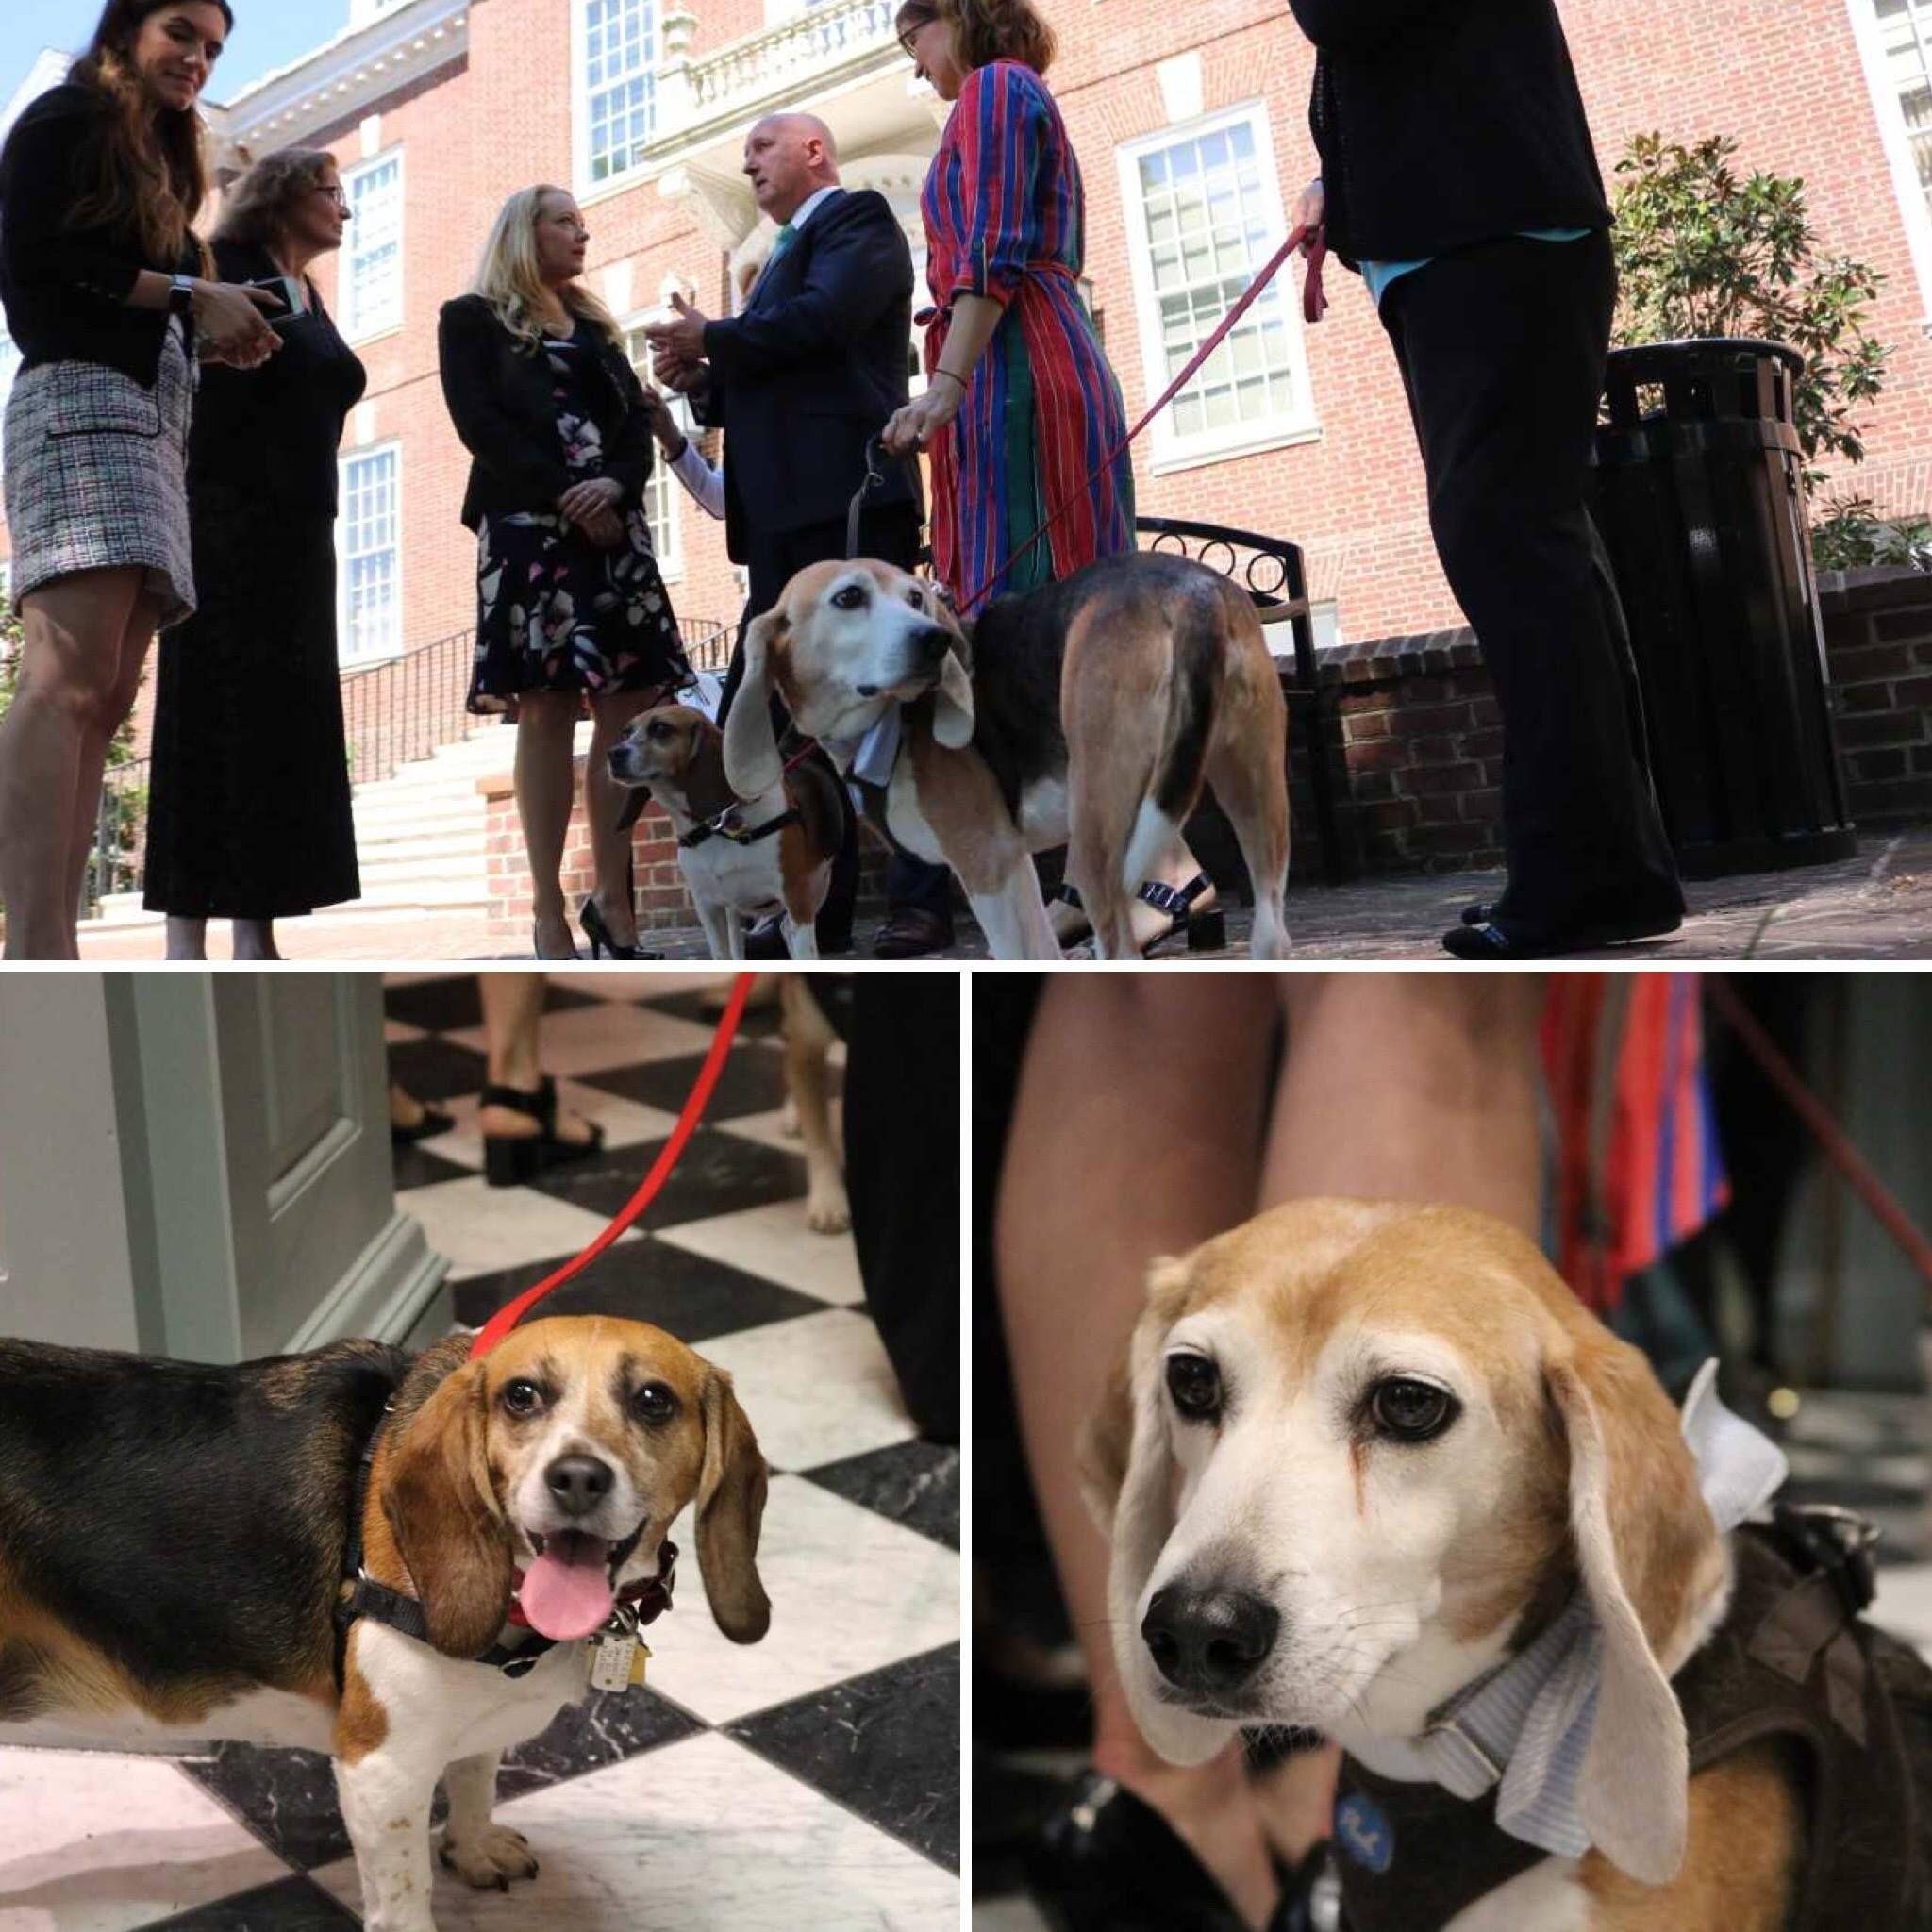 It S Worldweekforanimalsinlabs Our Beagle Freedom Bill Has